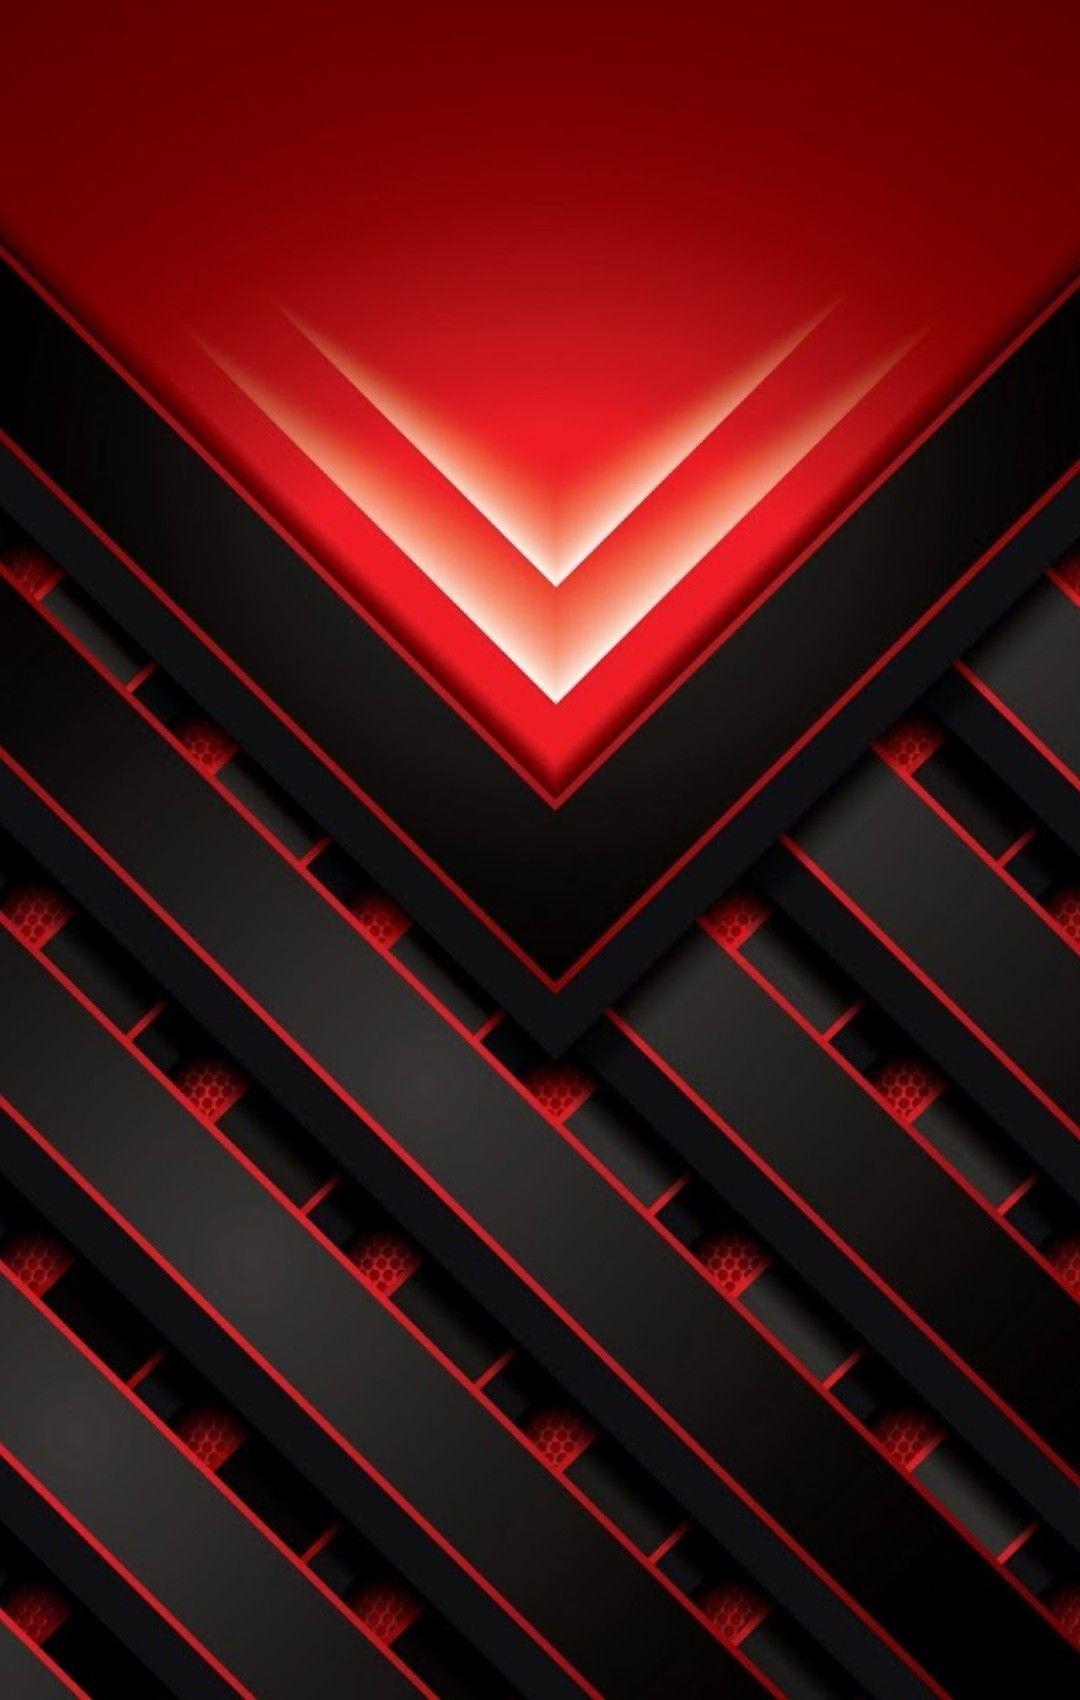 Abstract Iphone Wallpaper Iphone Wallpaper Geometric Wallpaper Geometric Wallpaper Abstract Iphone Wallpaper Red Wallpaper